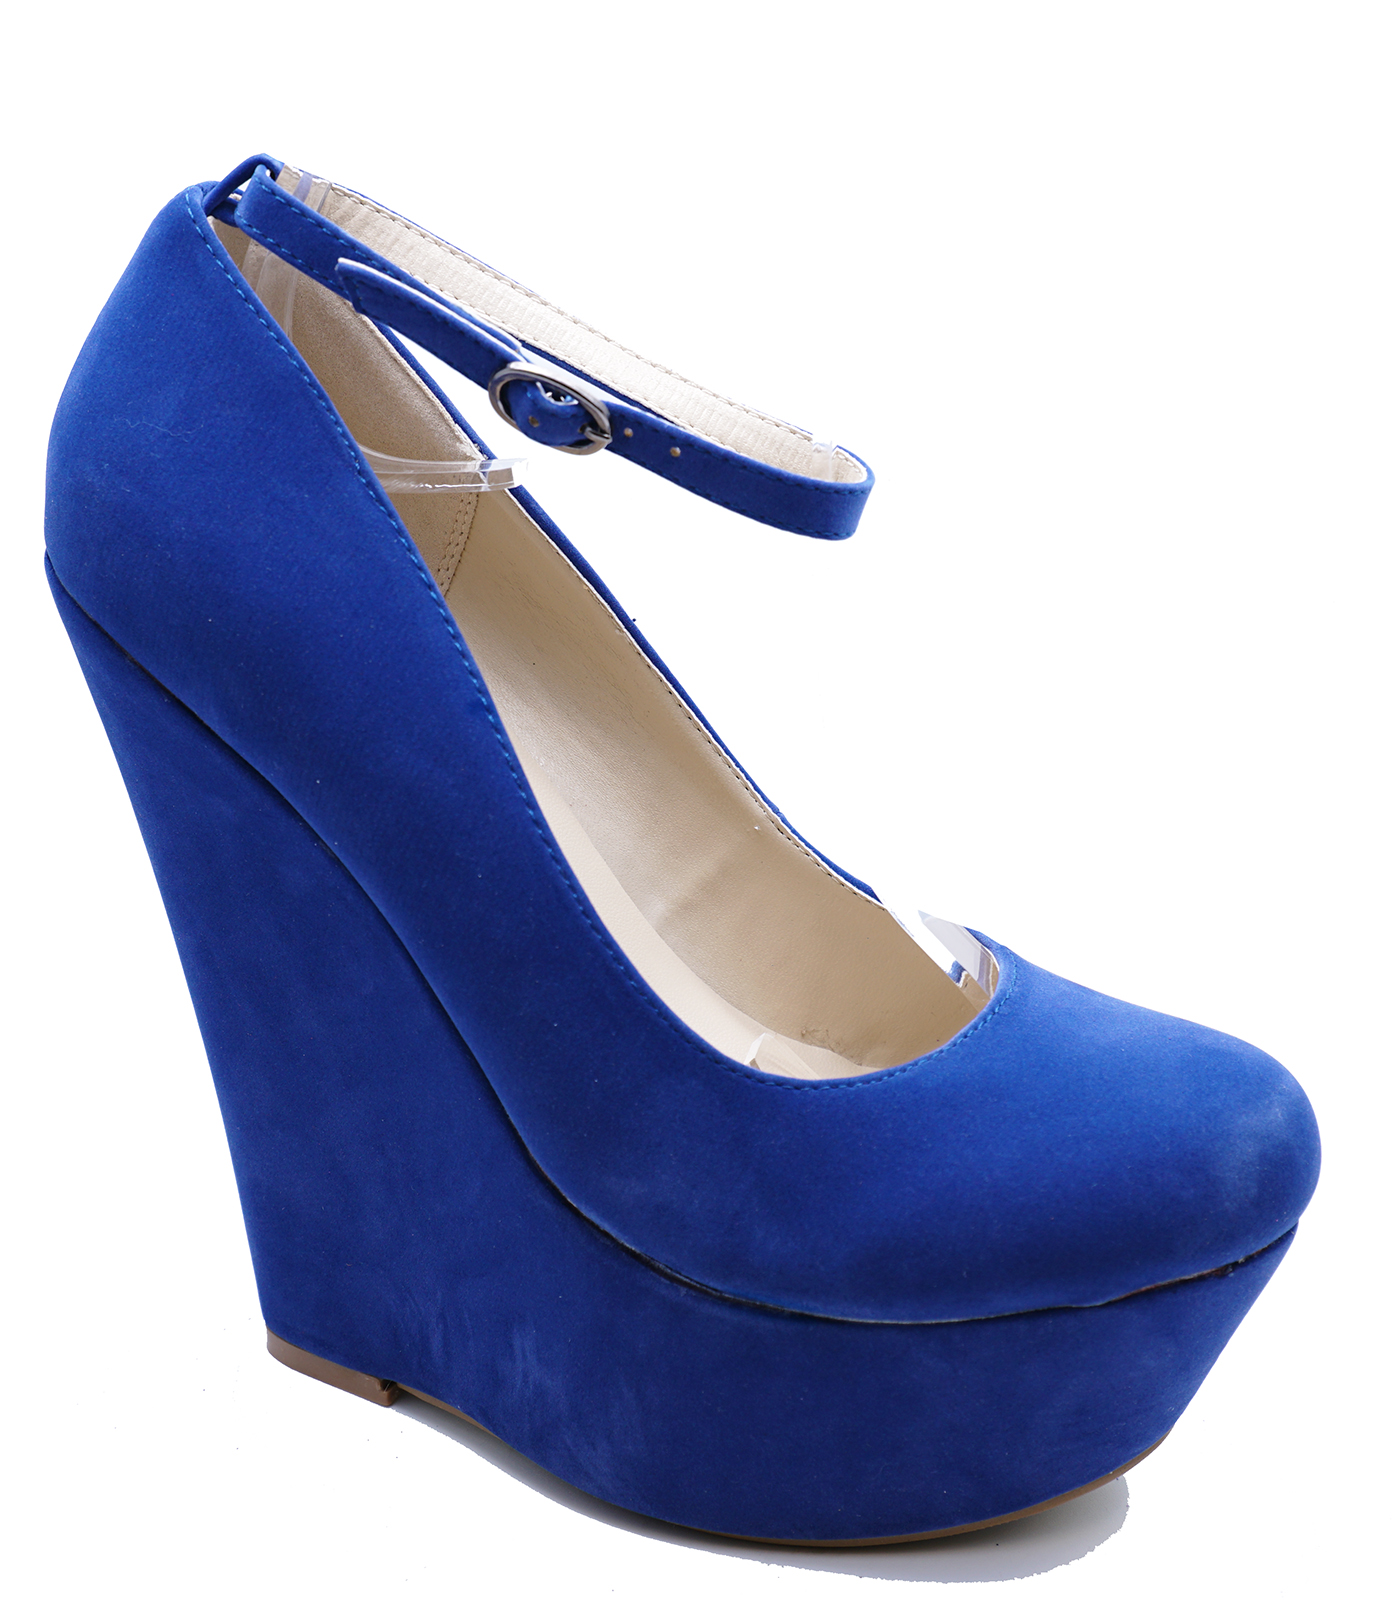 LADIES BLUE SLIP-ON WEDGE HIGH HEEL PLATFORM COURT PARTY SHOES PUMPS SIZES 3-7